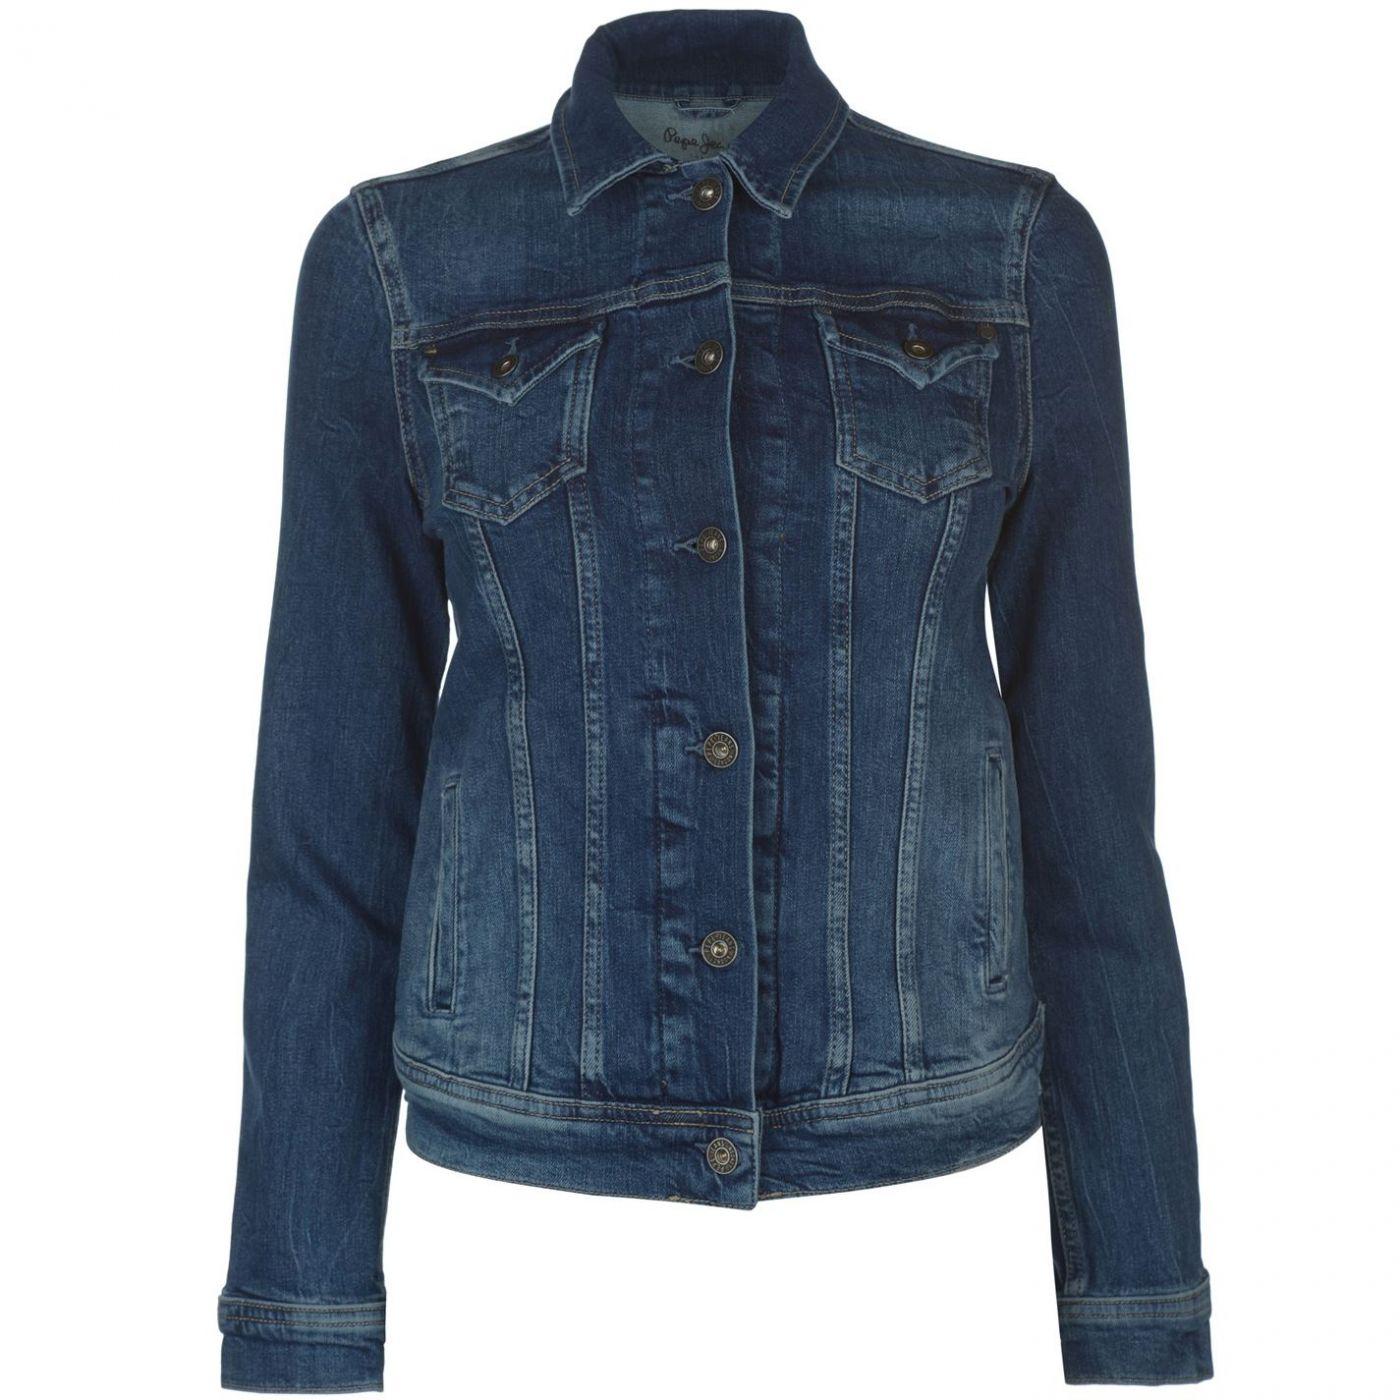 Pepe Jeans Thrift Denim Jacket